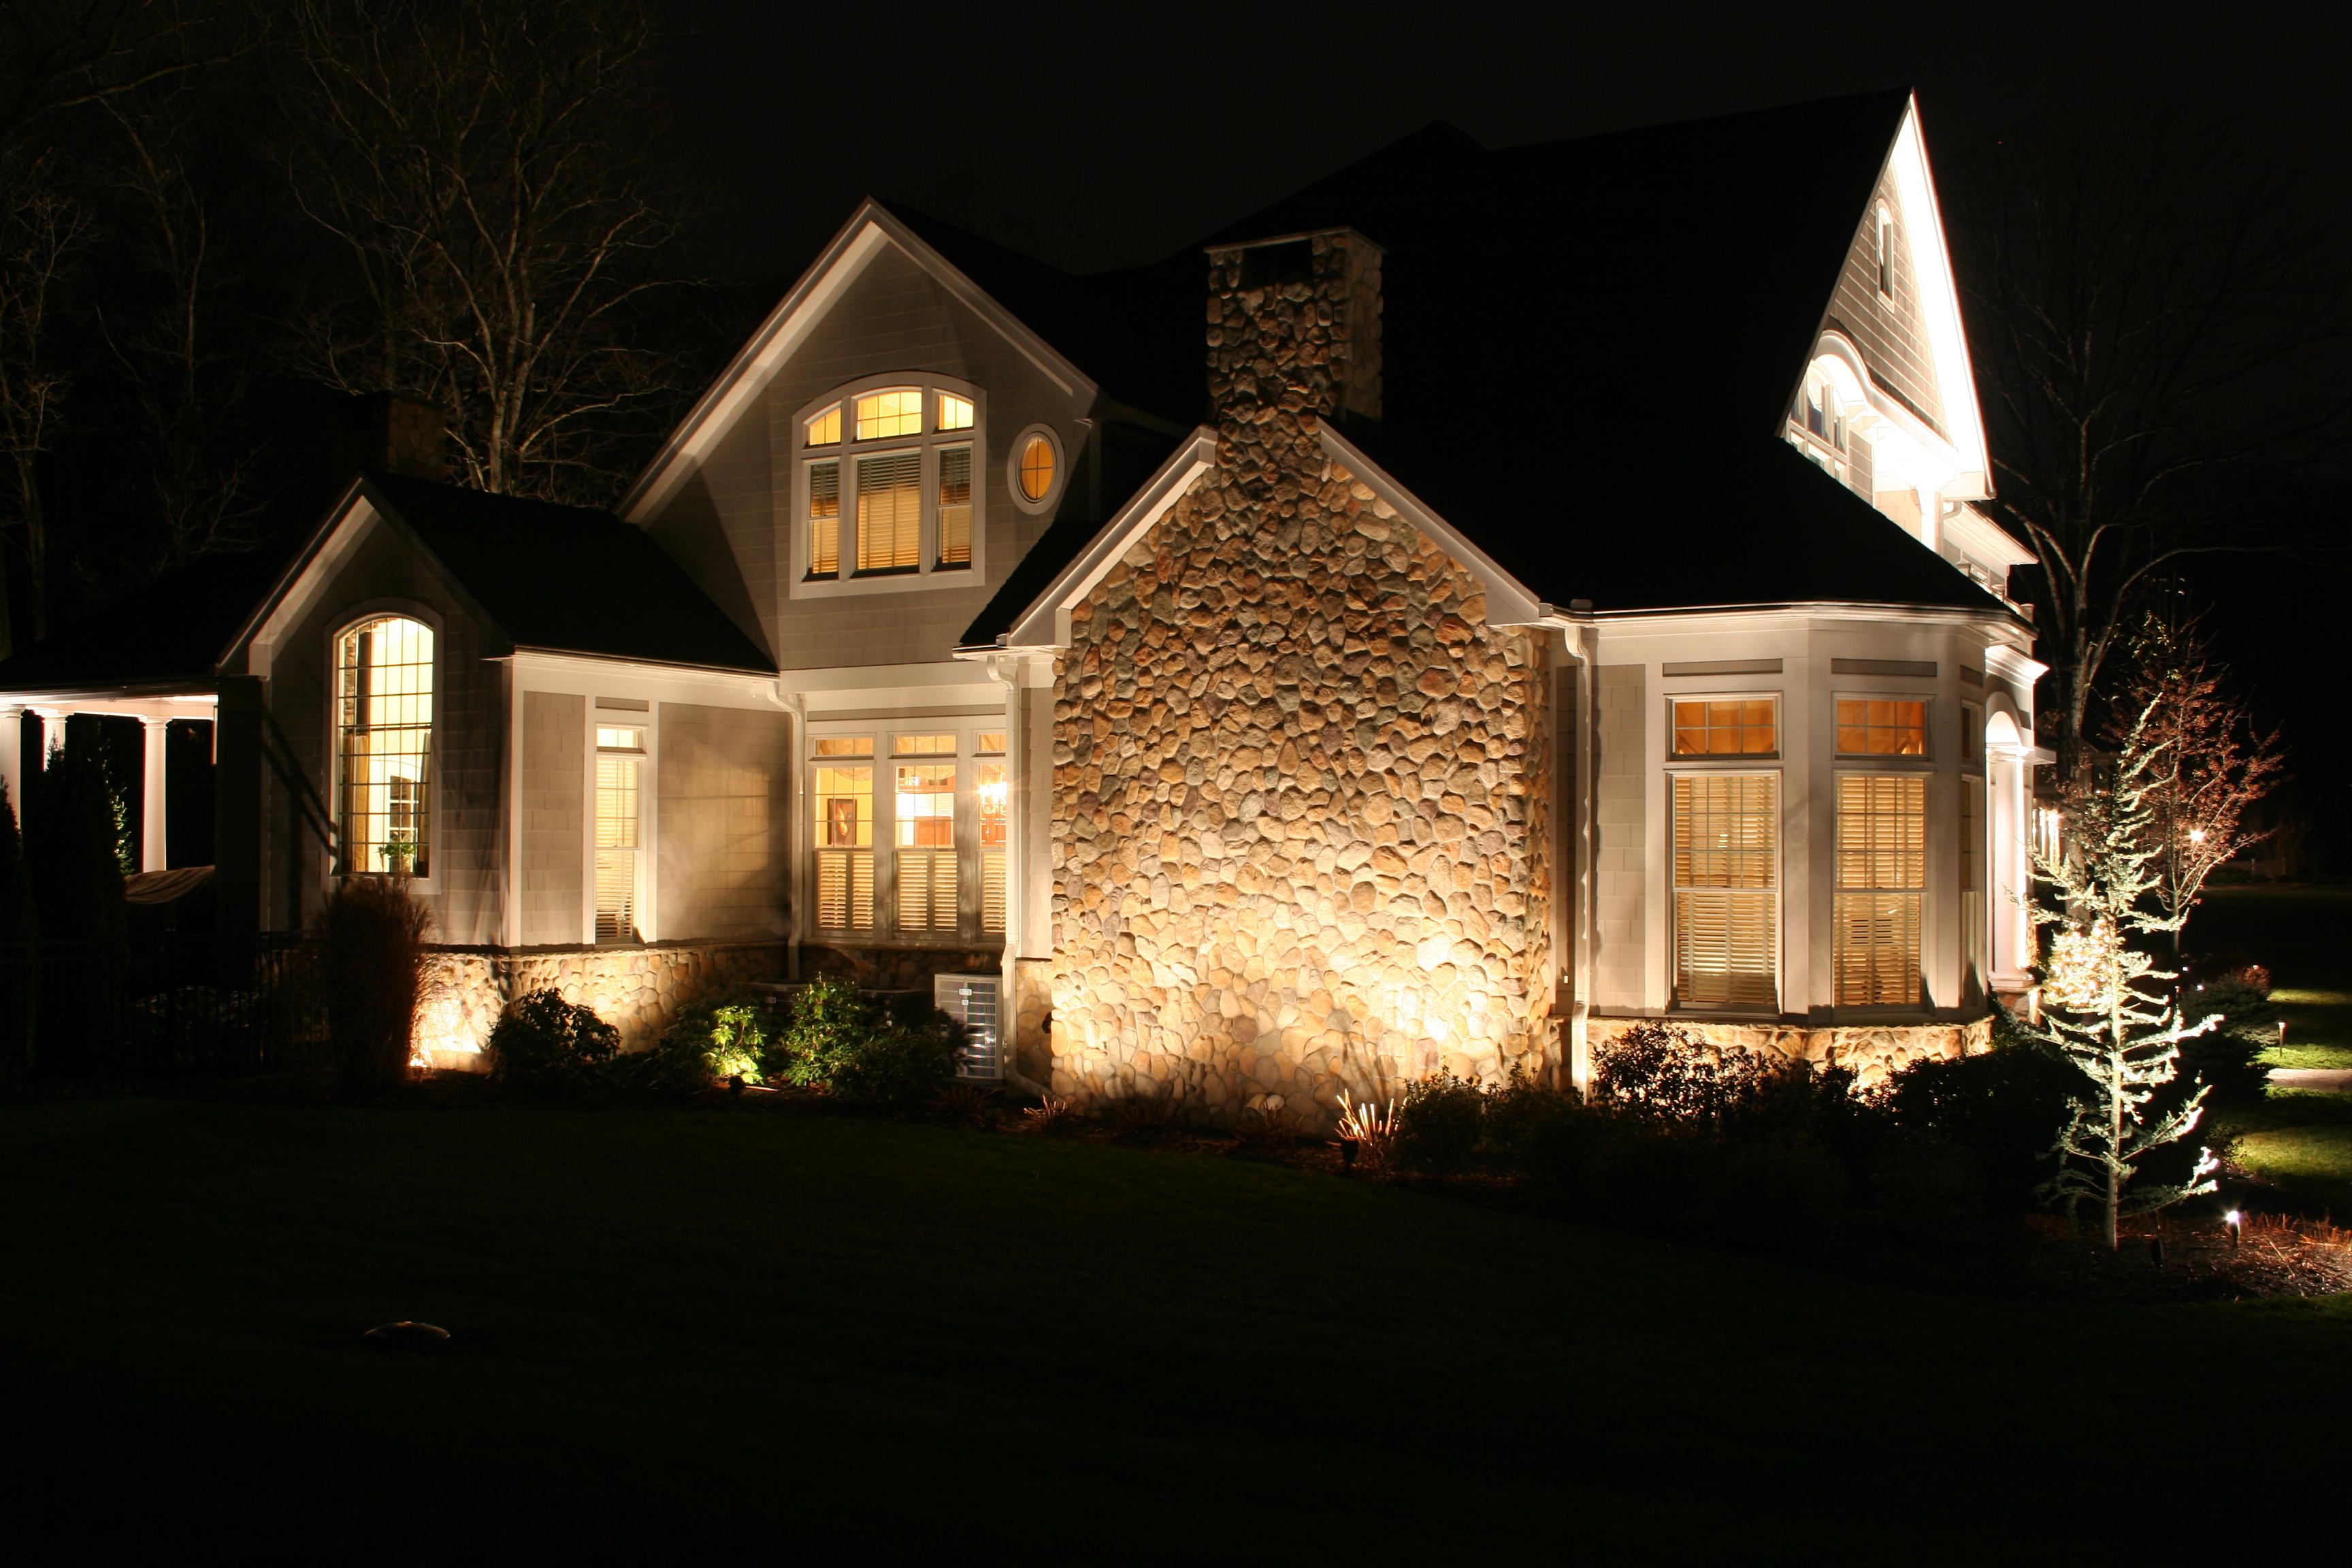 Landscape Lighting Designer Michael Gotowala Shows Us A